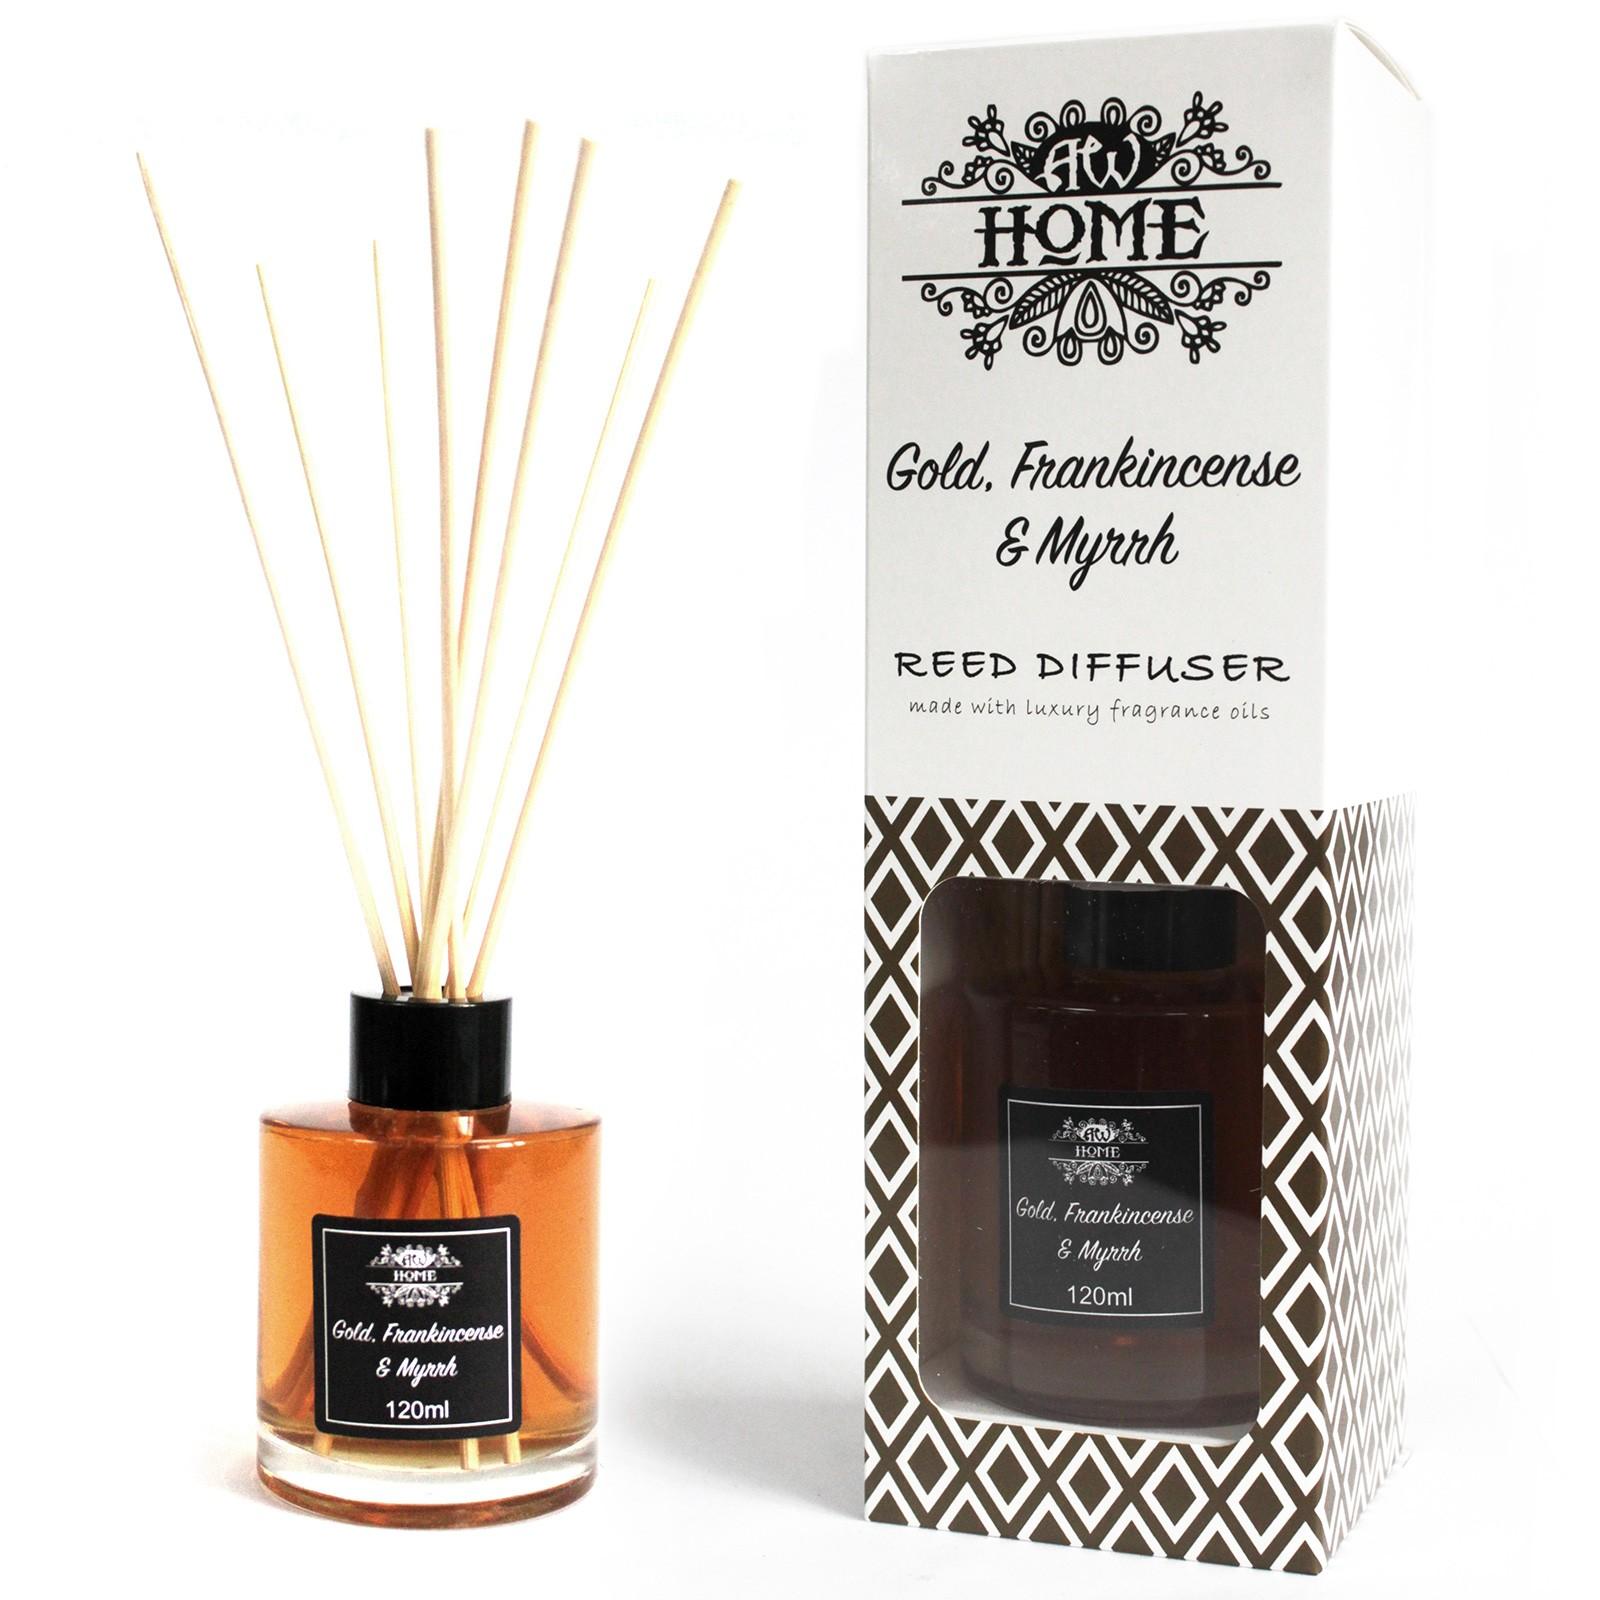 120ml Reed Diffuser Gold Frankincense and Myrrh